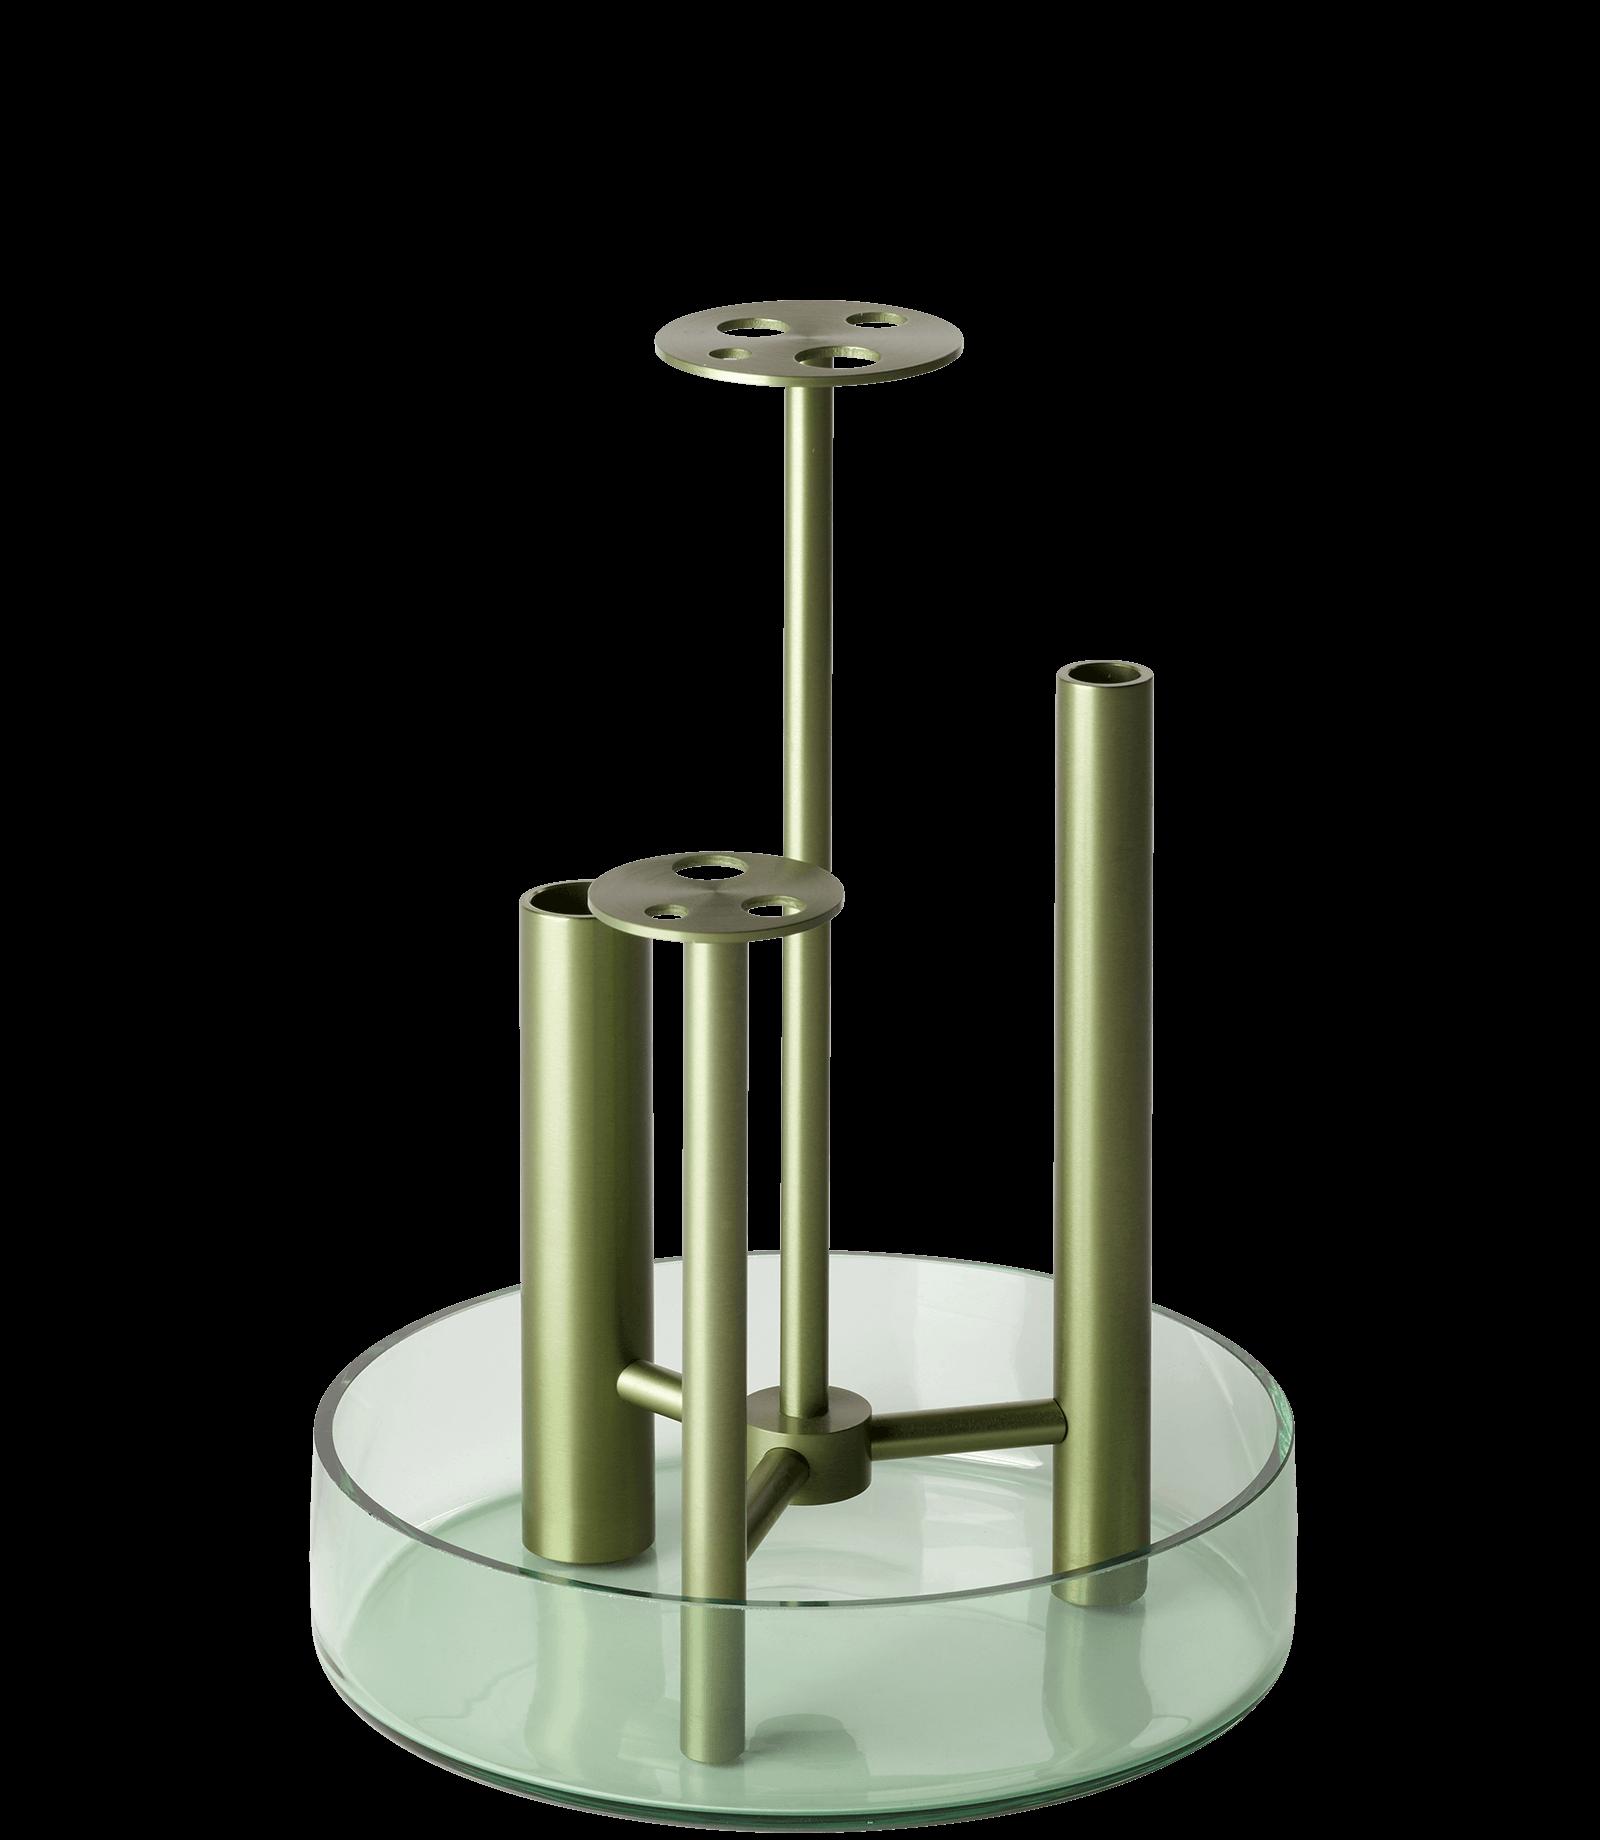 FRITZHANSEN(フリッツハンセン)Ikeru vase, high  (イケルベース ハイ)フラワーベース/花瓶